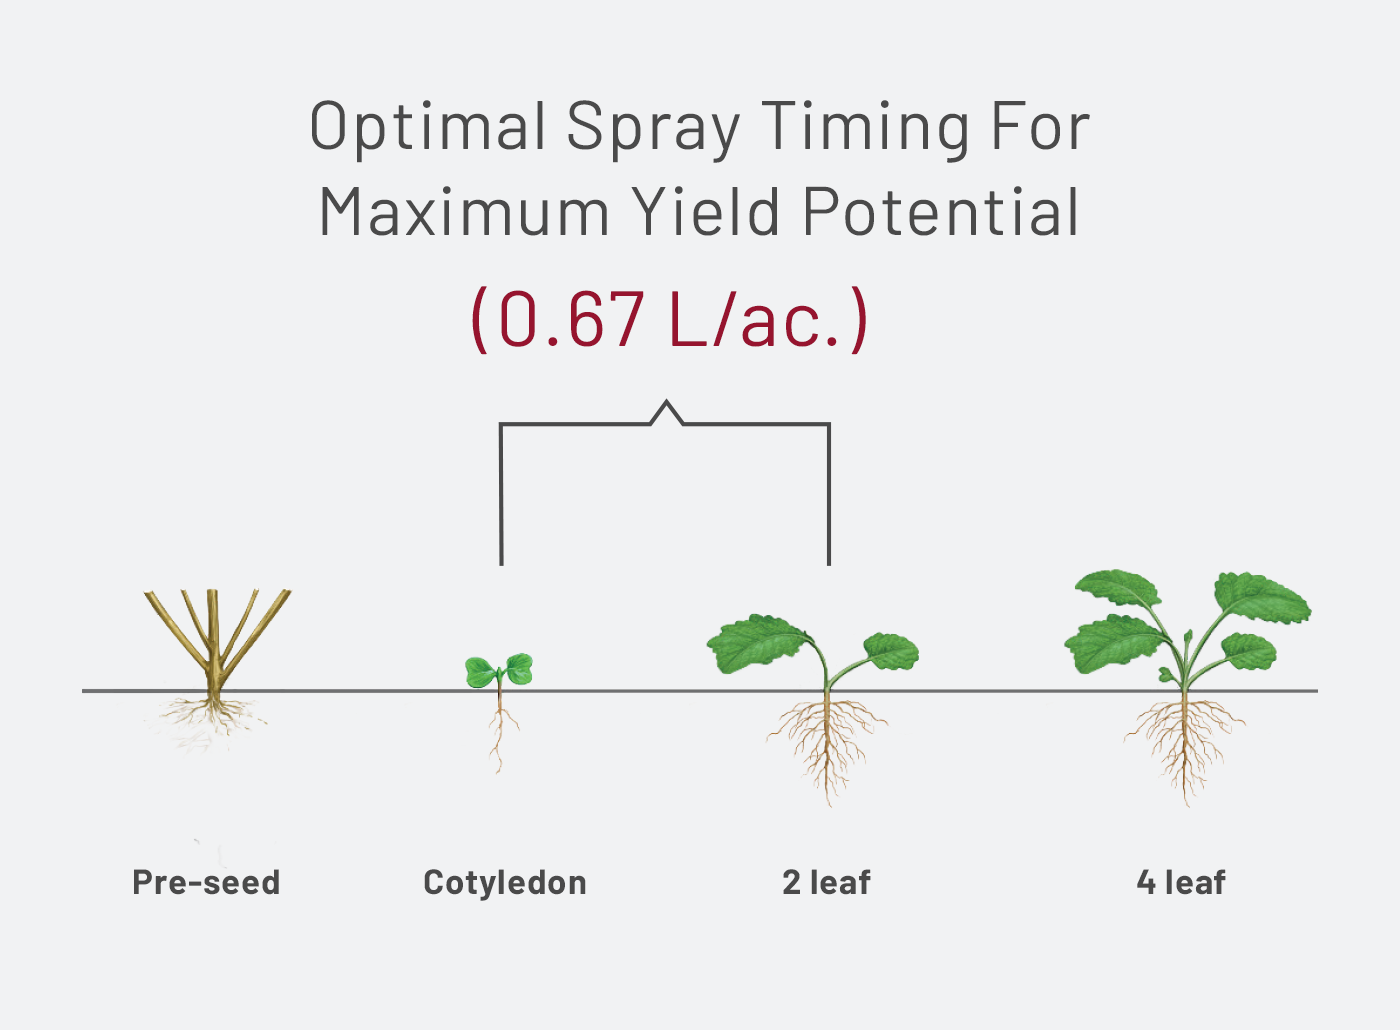 TruFlex Canola optimal spray timing chart